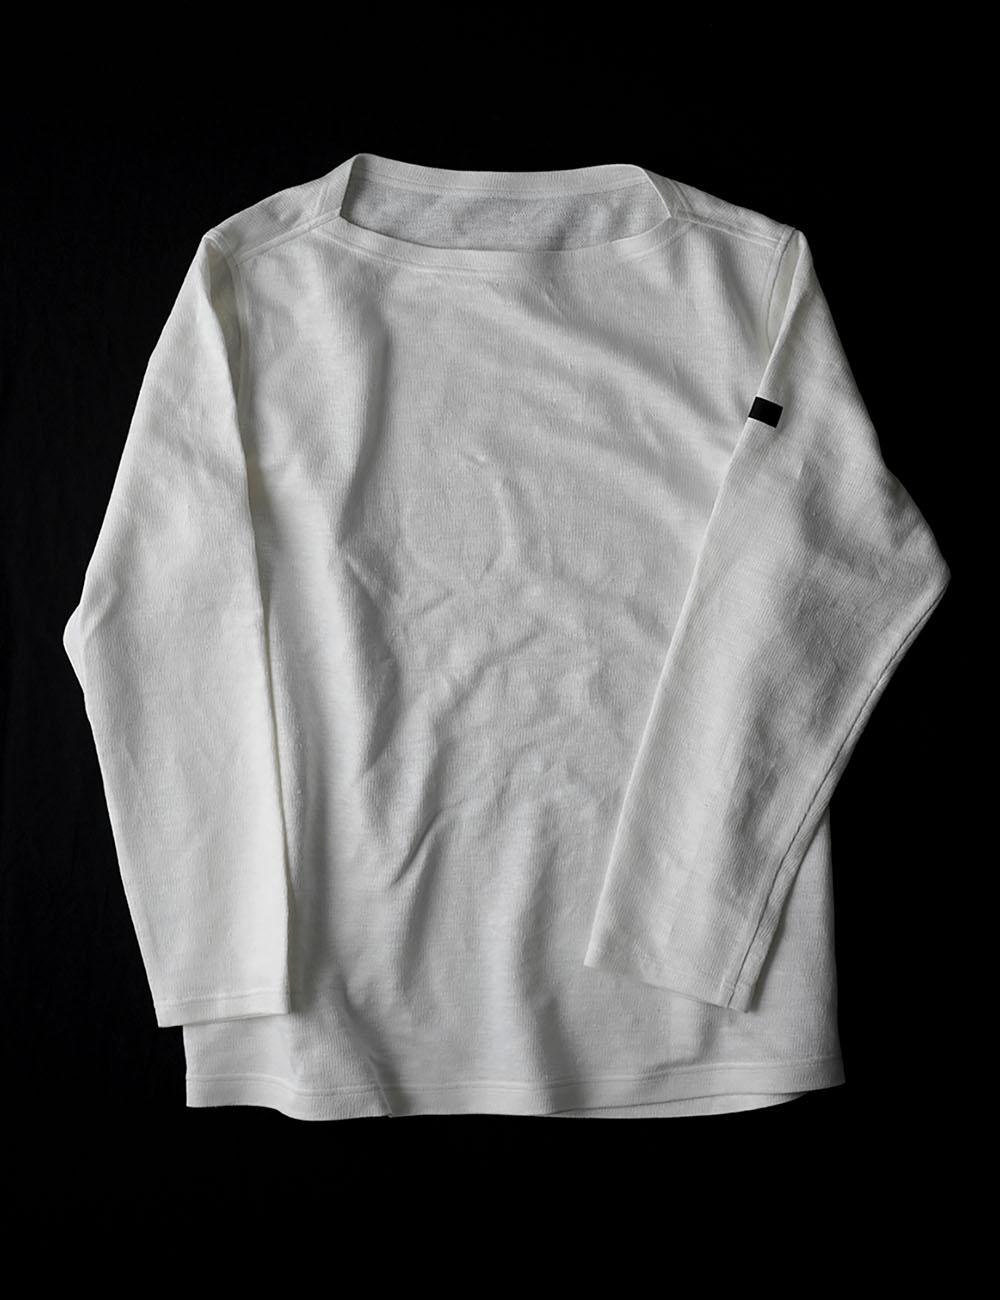 【wafuオリジナル】【早割】唯一無二のリネン100% 編み地 ボートネックT 縮むのでその分大きくしています。 /ホワイト t020i-wht3